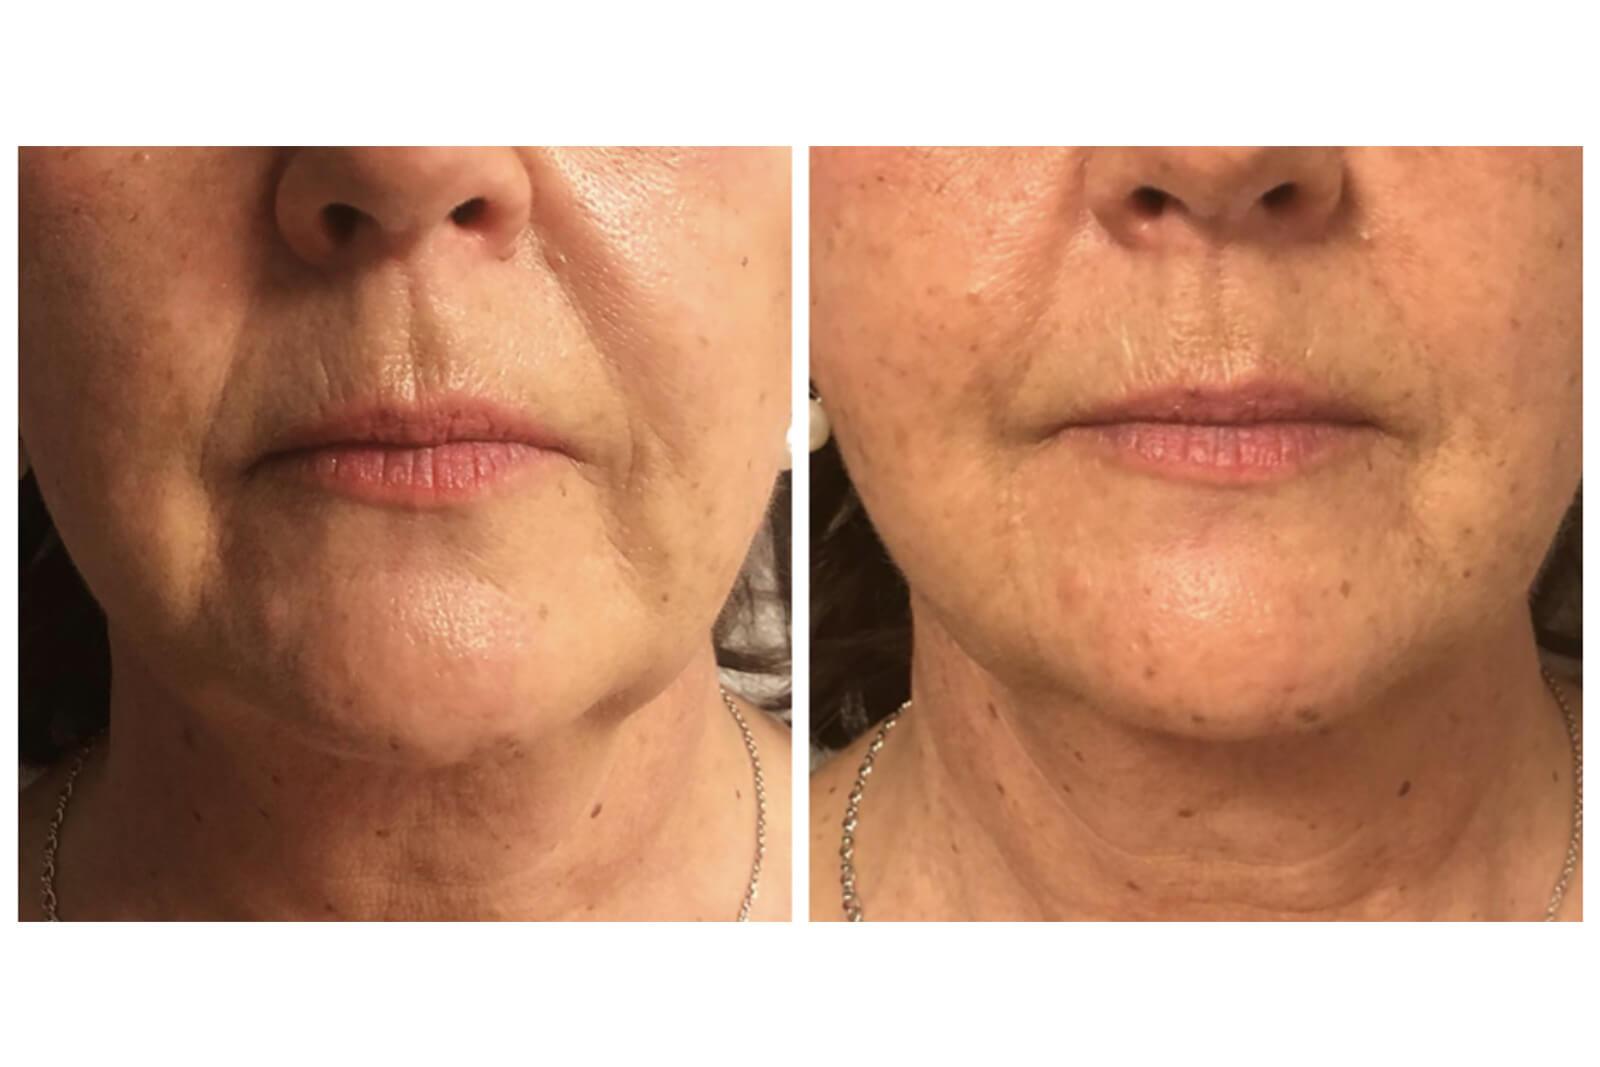 visage - restructuration visage ou profiloplastie 2